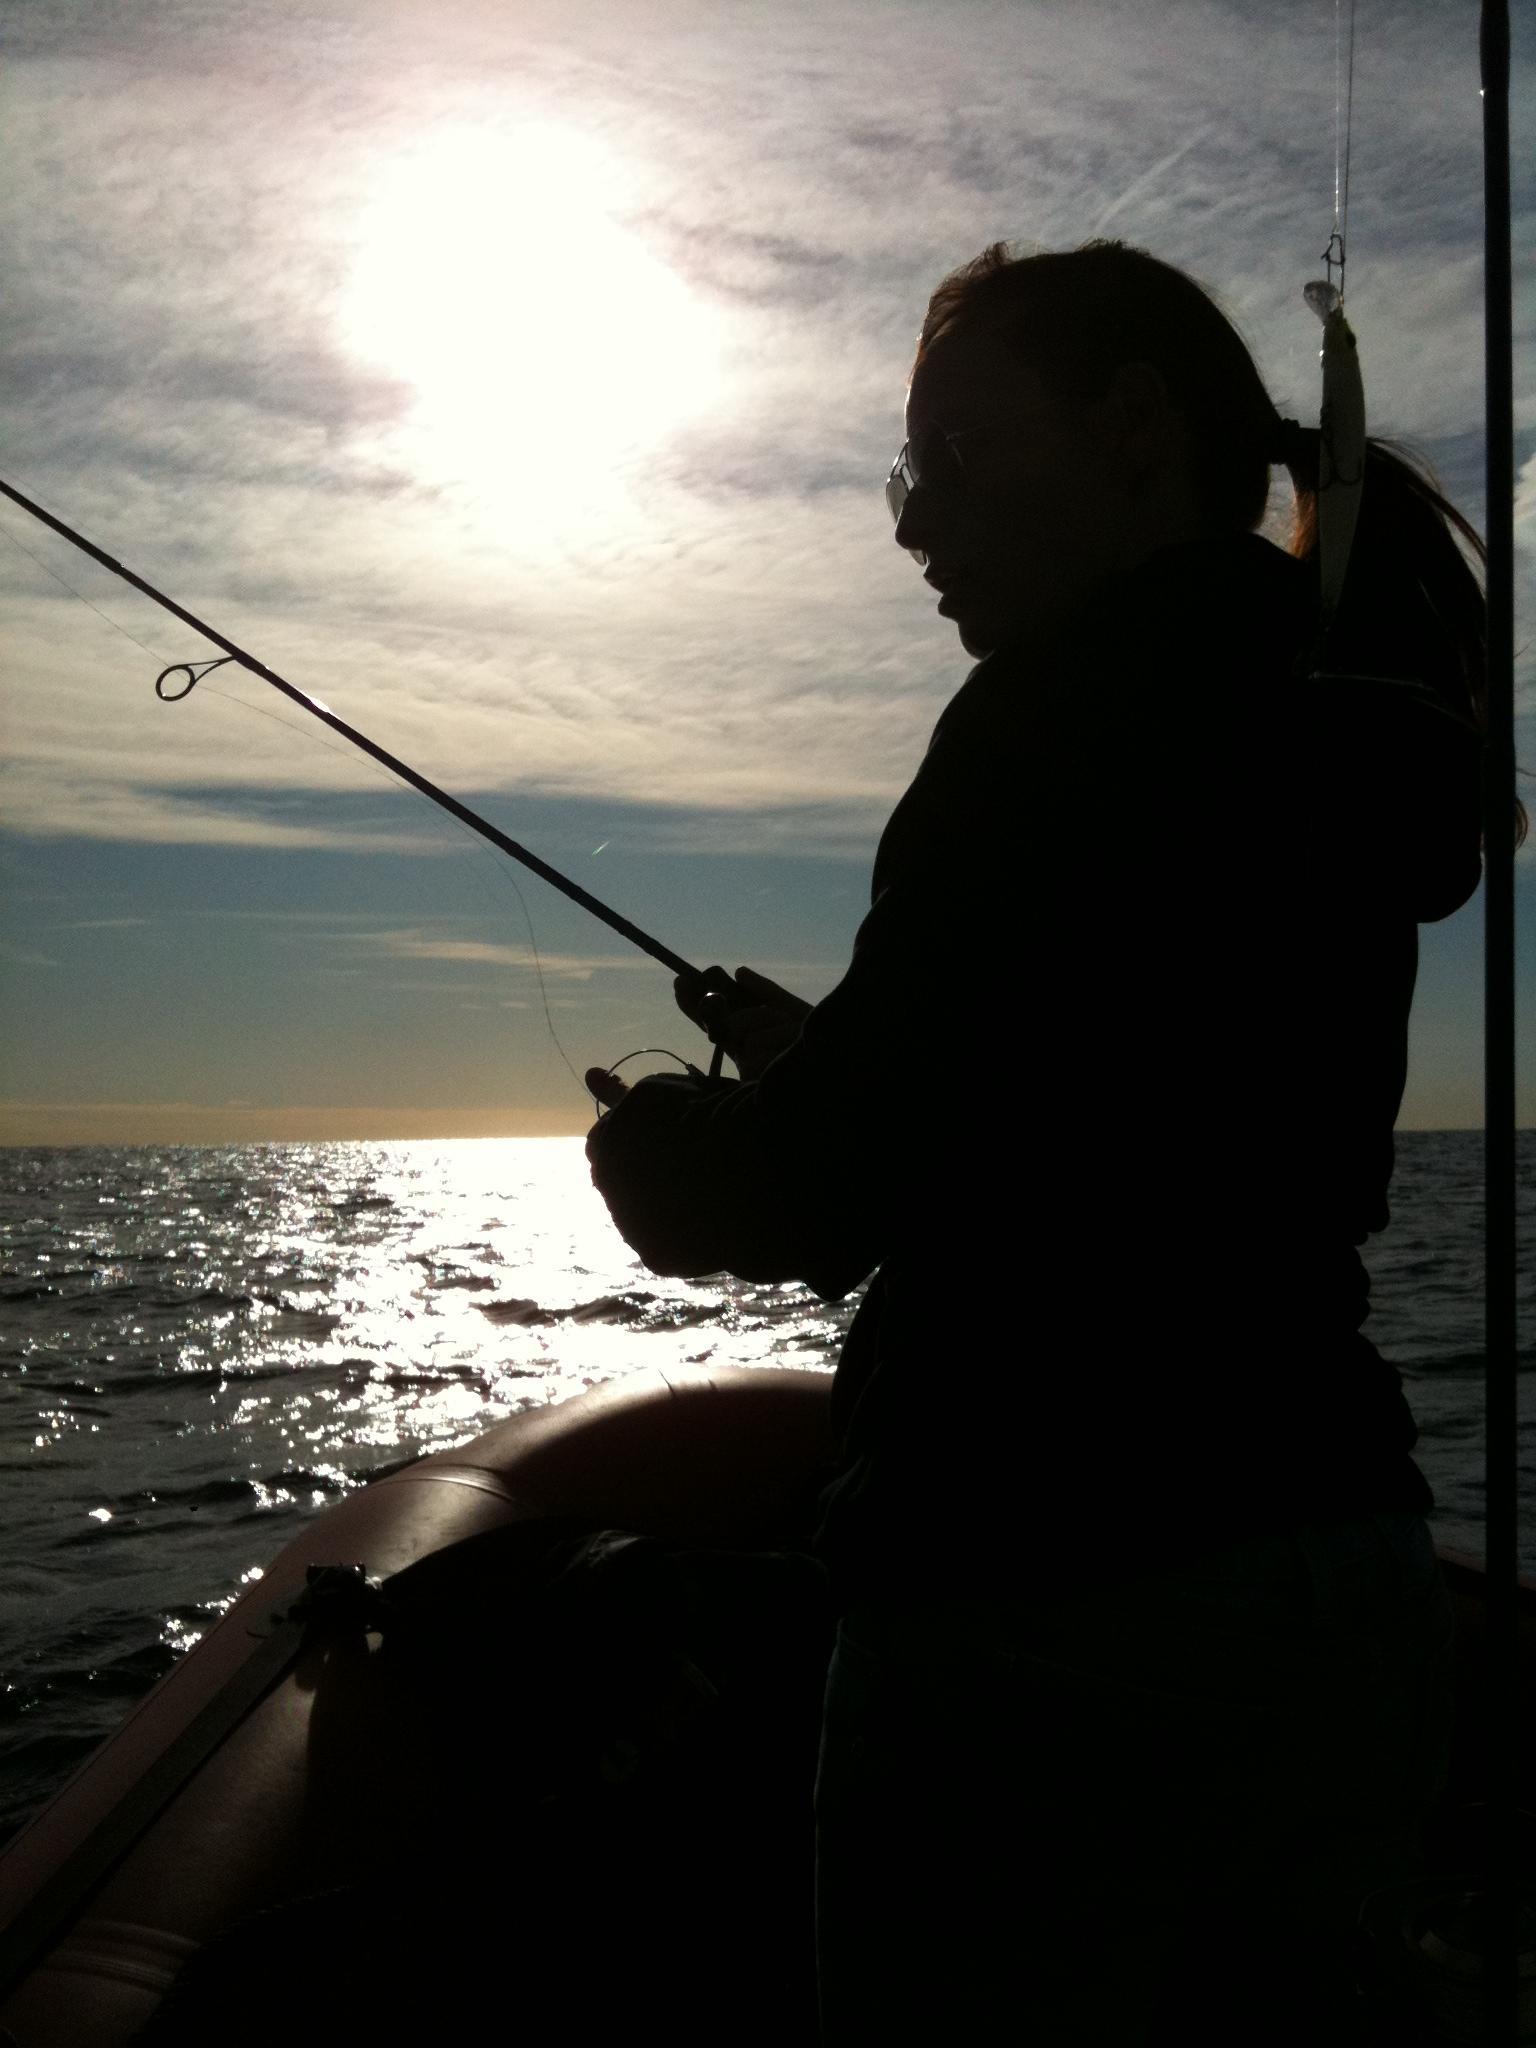 Pêche au féminin